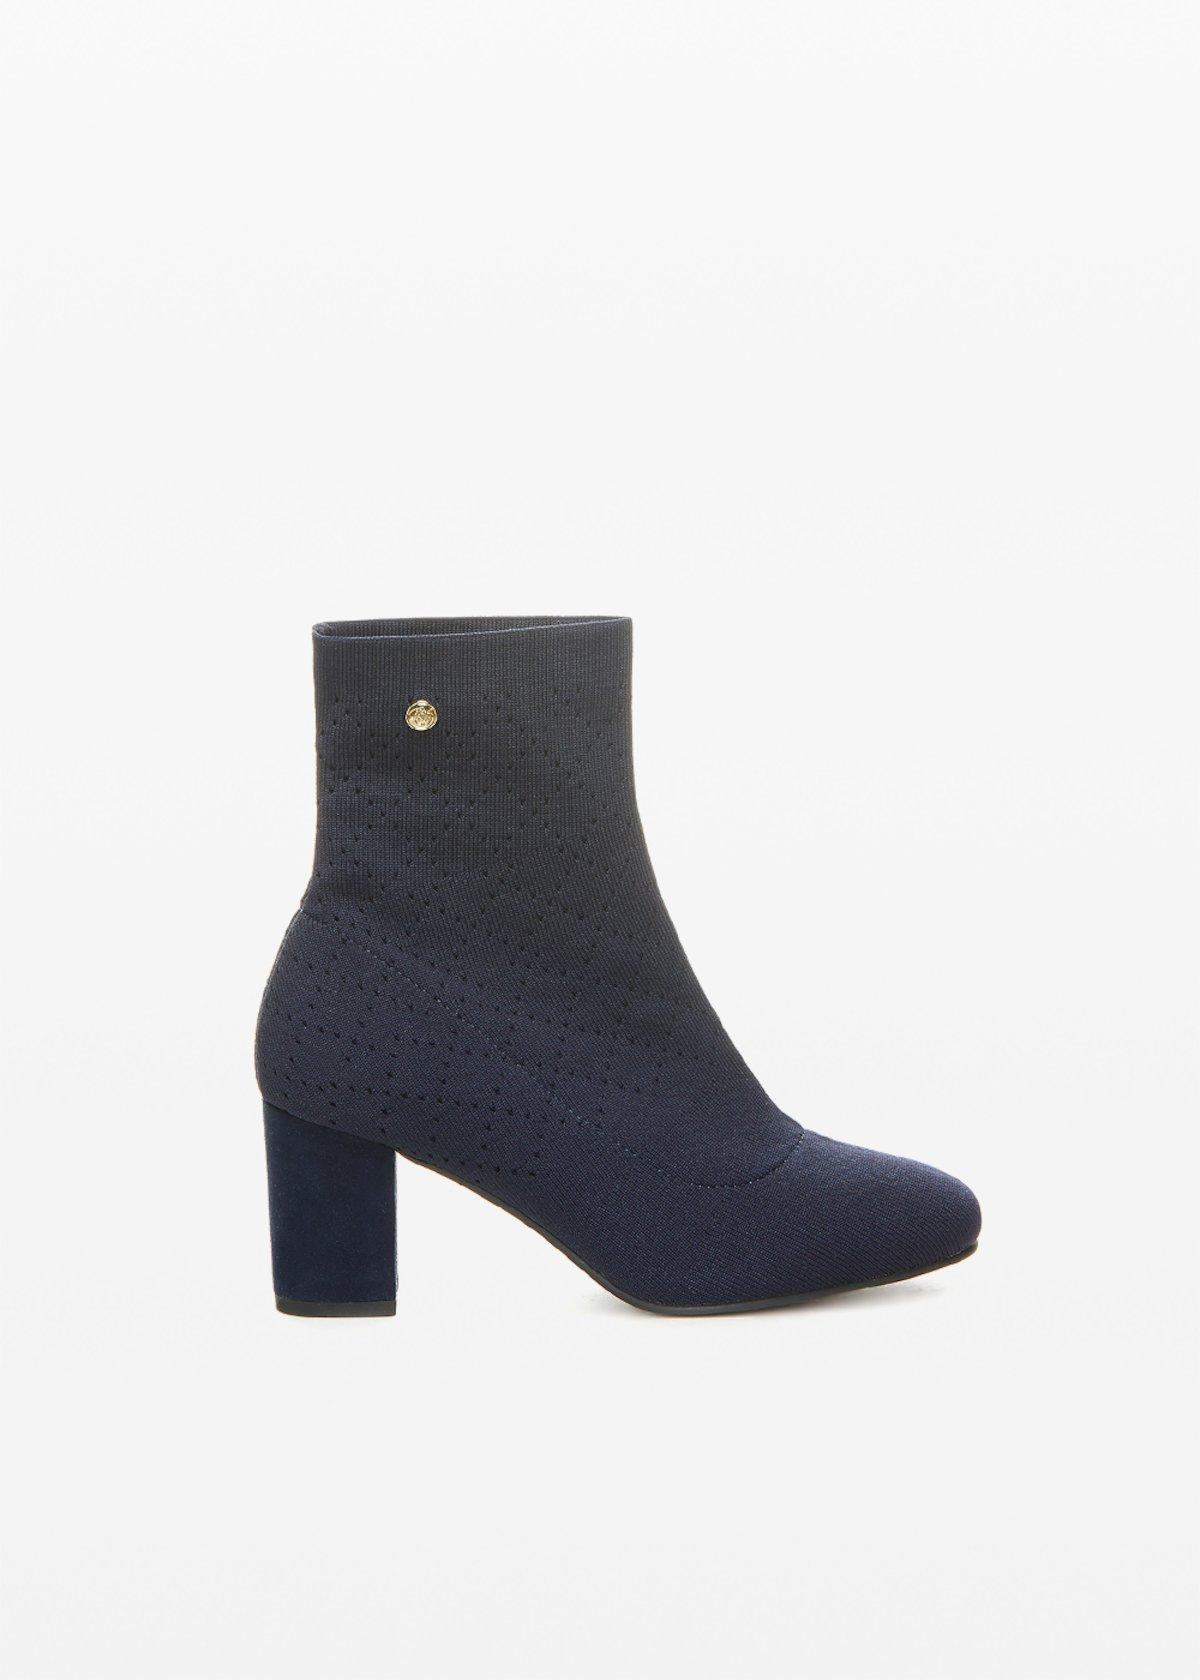 Stivaletti Stash in maglia sock effect - Medium Blue - Donna - Immagine categoria